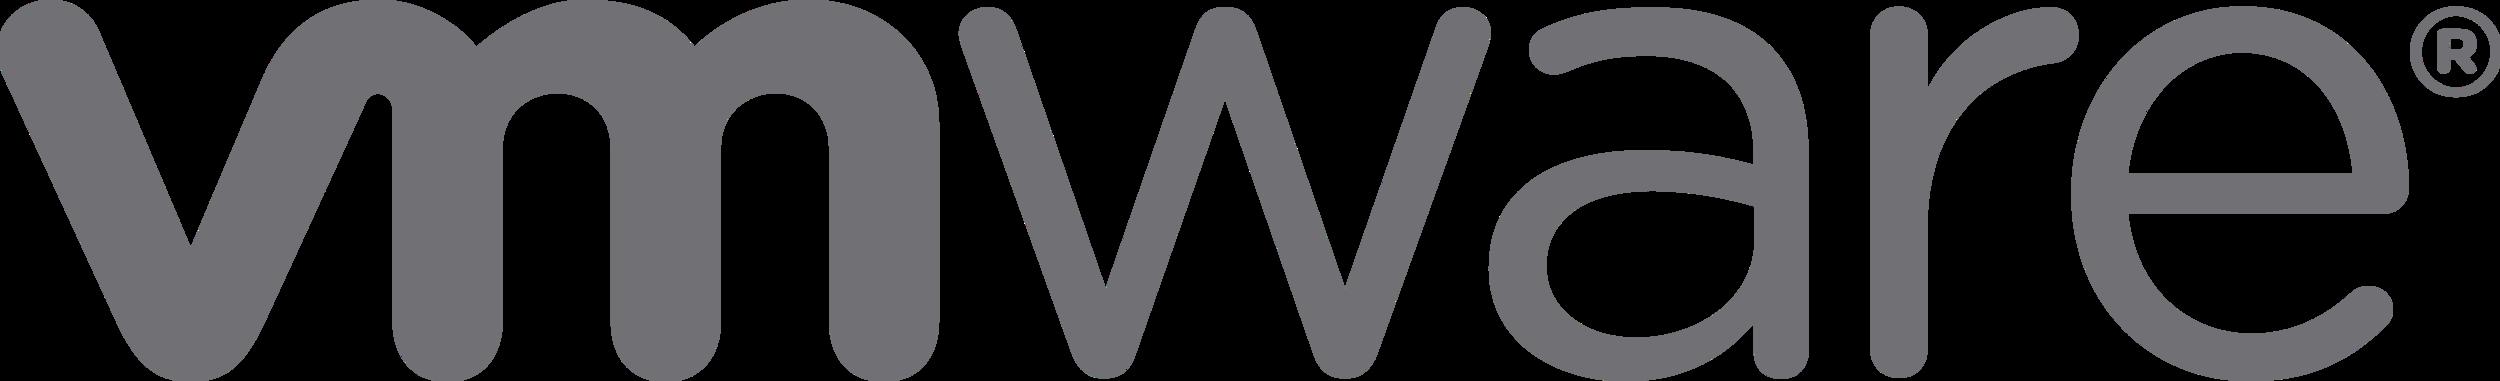 vmware-symbol-png-logo-3.png